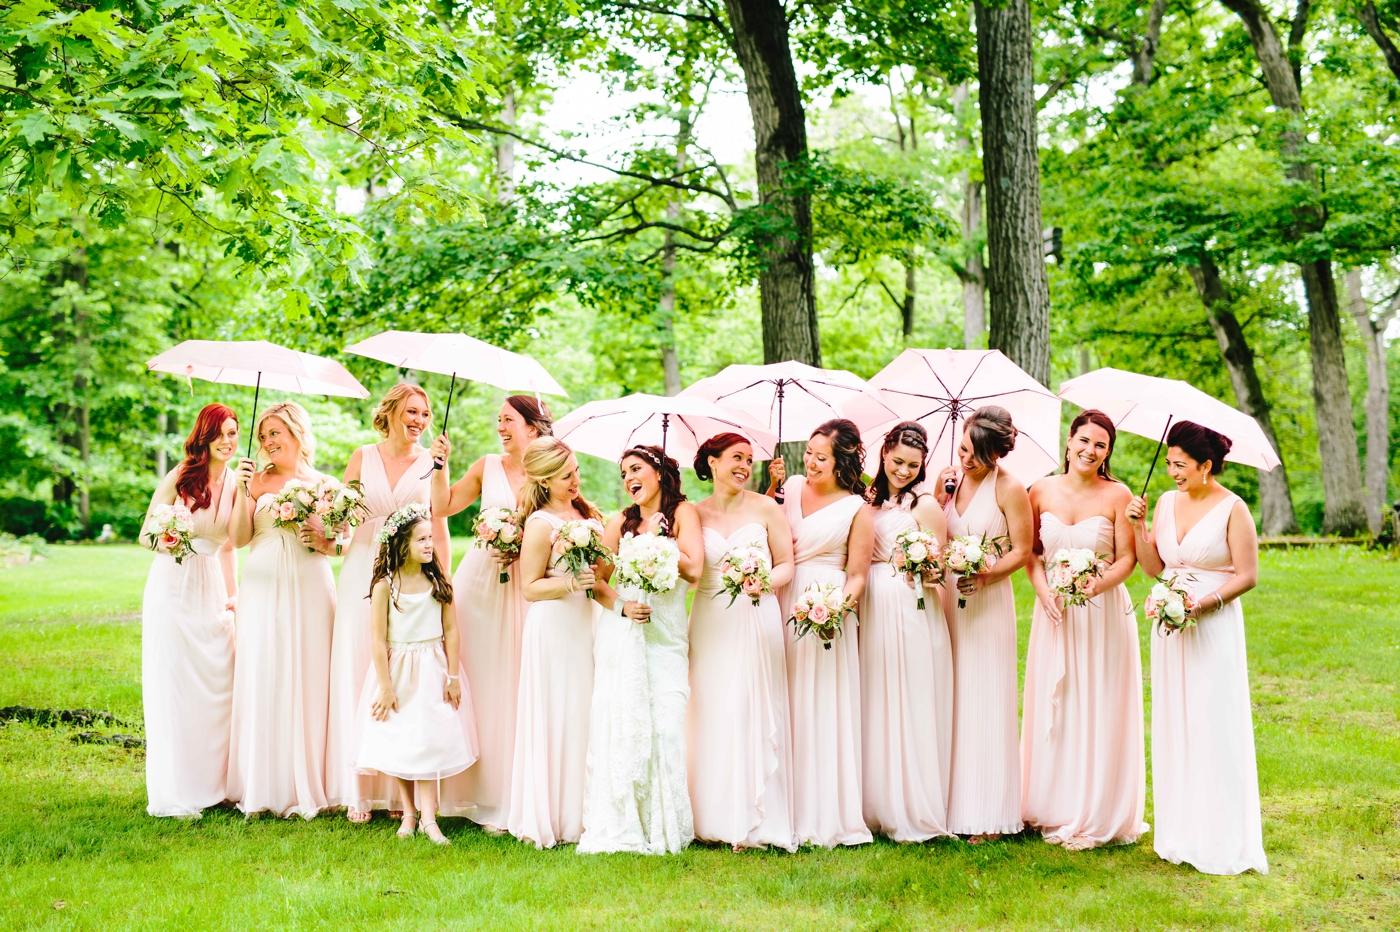 chicago-fine-art-wedding-photography-svihra12